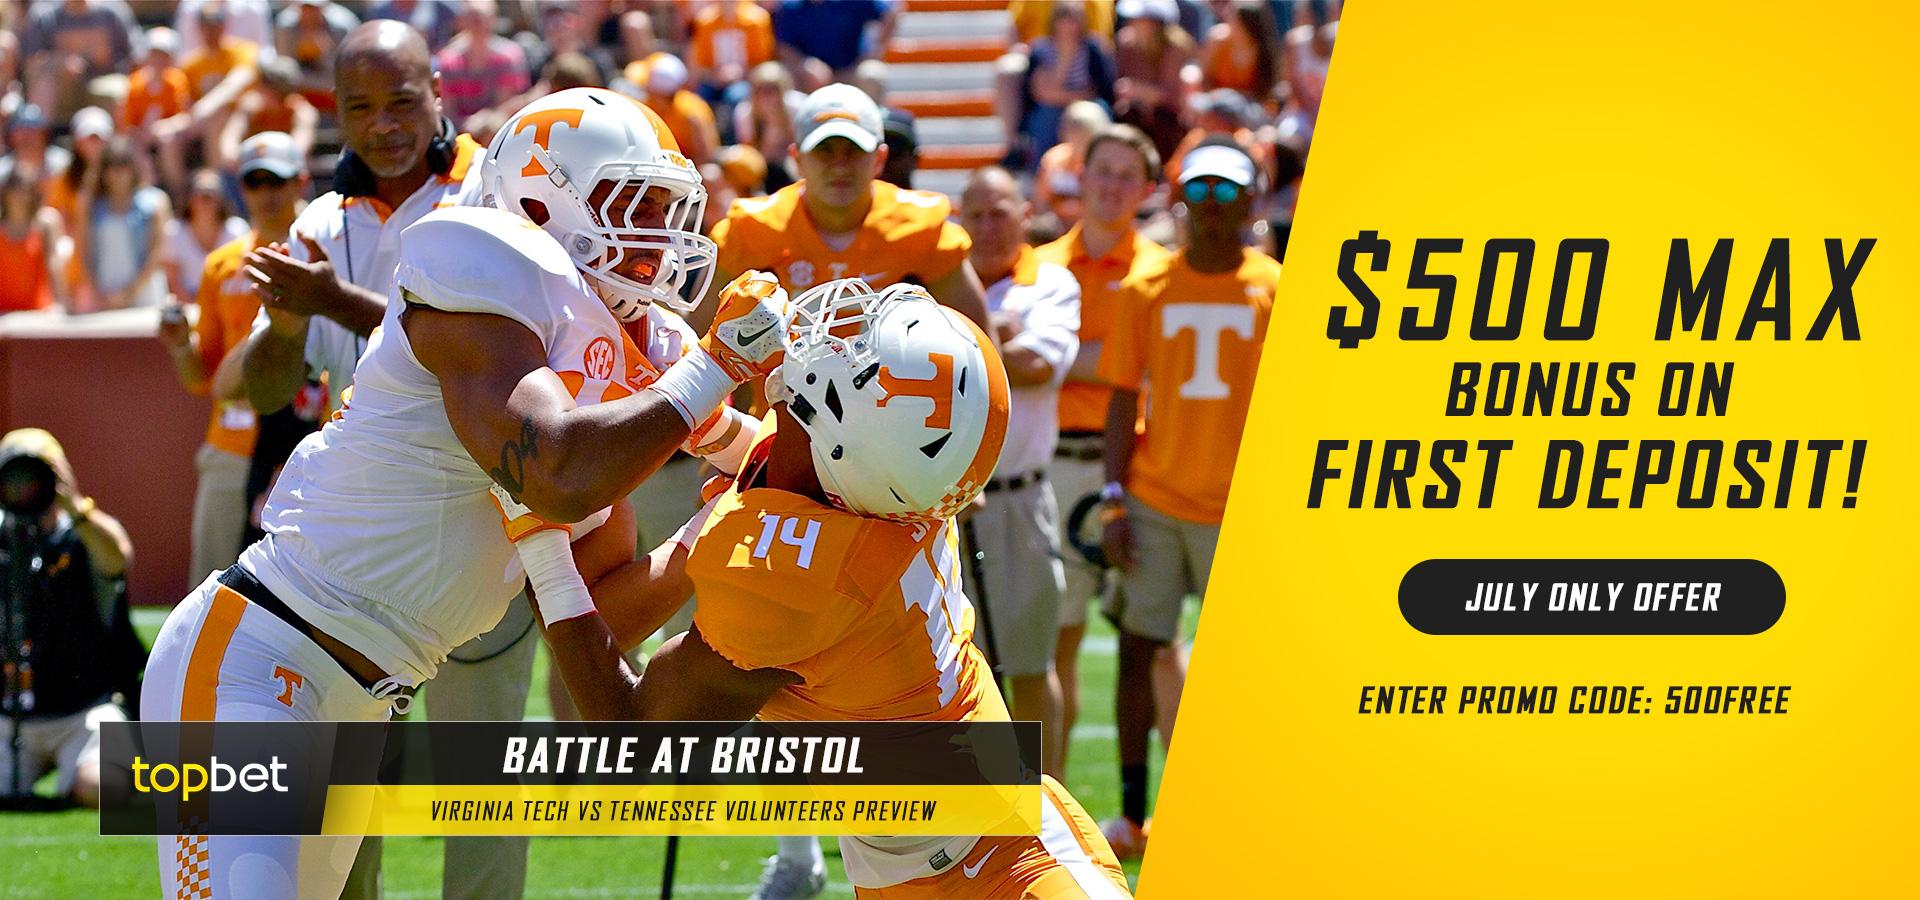 Battle At Bristol Virginia Tech Vs Tennessee Predictions